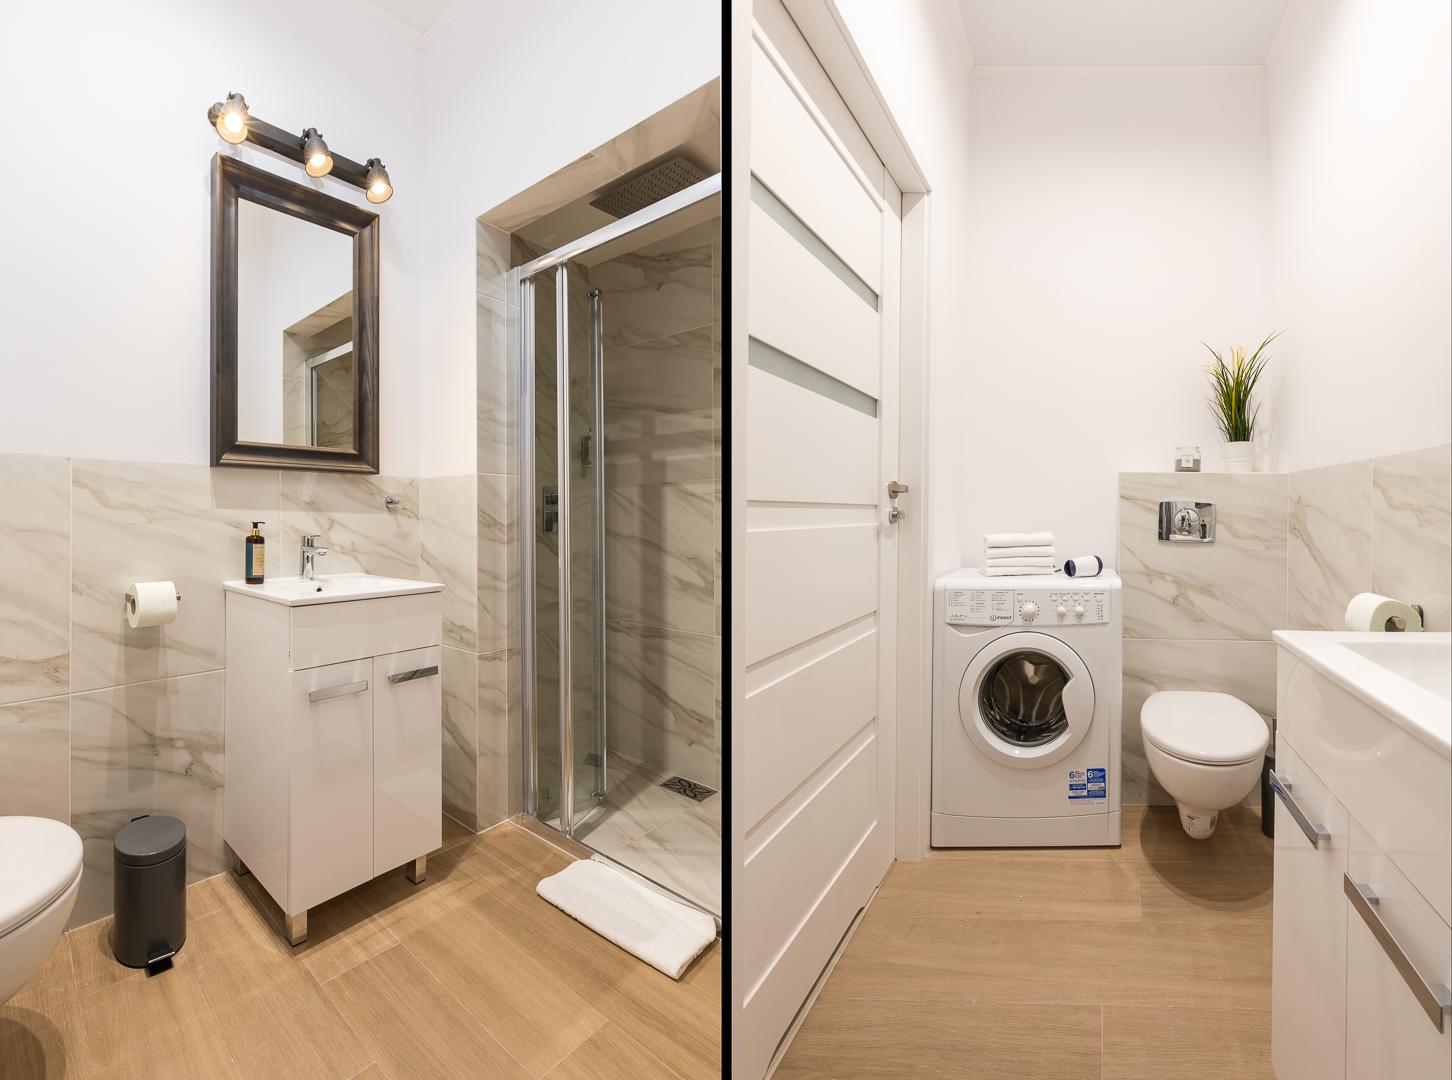 Bathroom at Wspolna Apartments